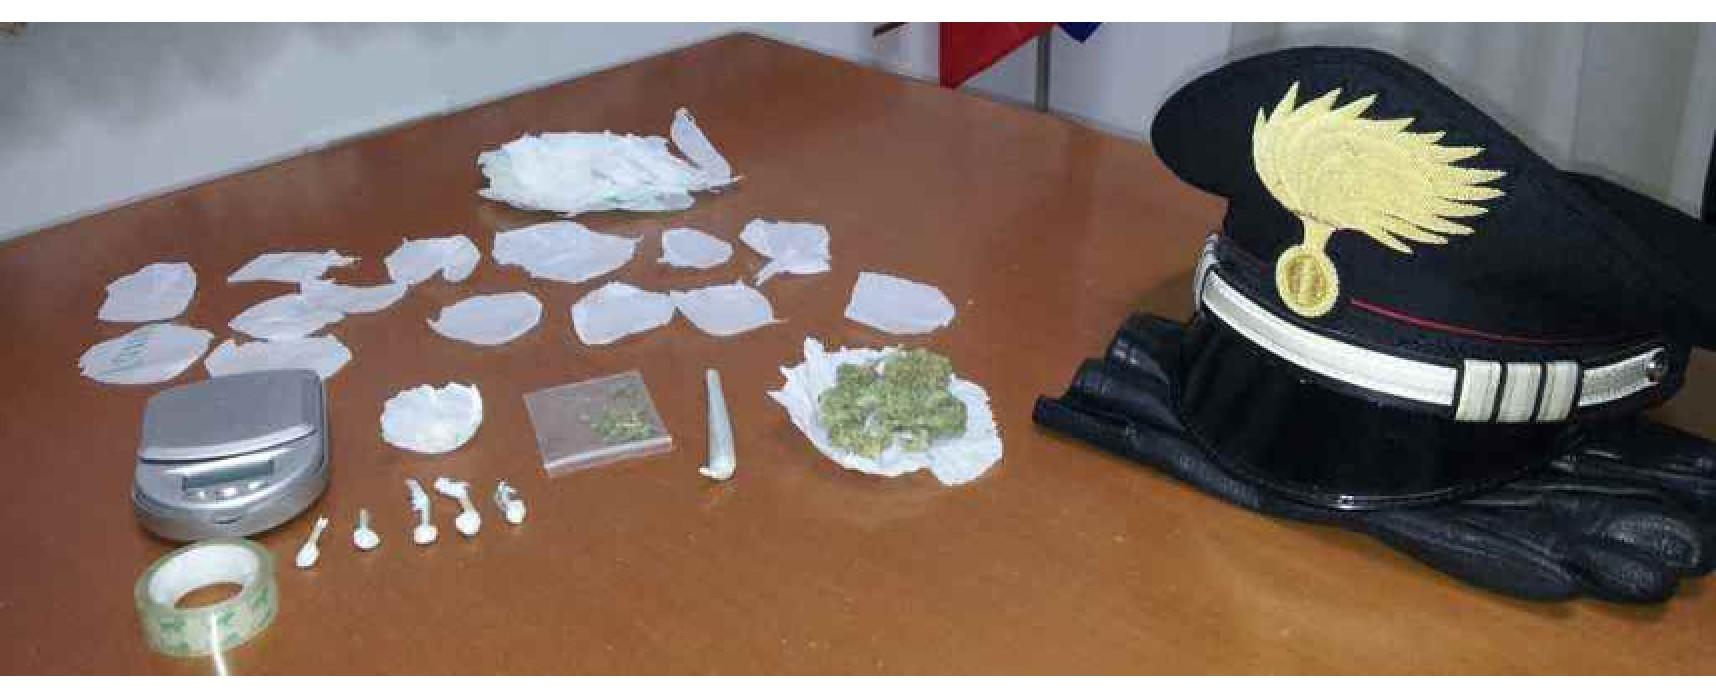 Carabinieri arrestano quattro 18enni e un 20enne. Confezionavano ketamina pronta per lo spaccio